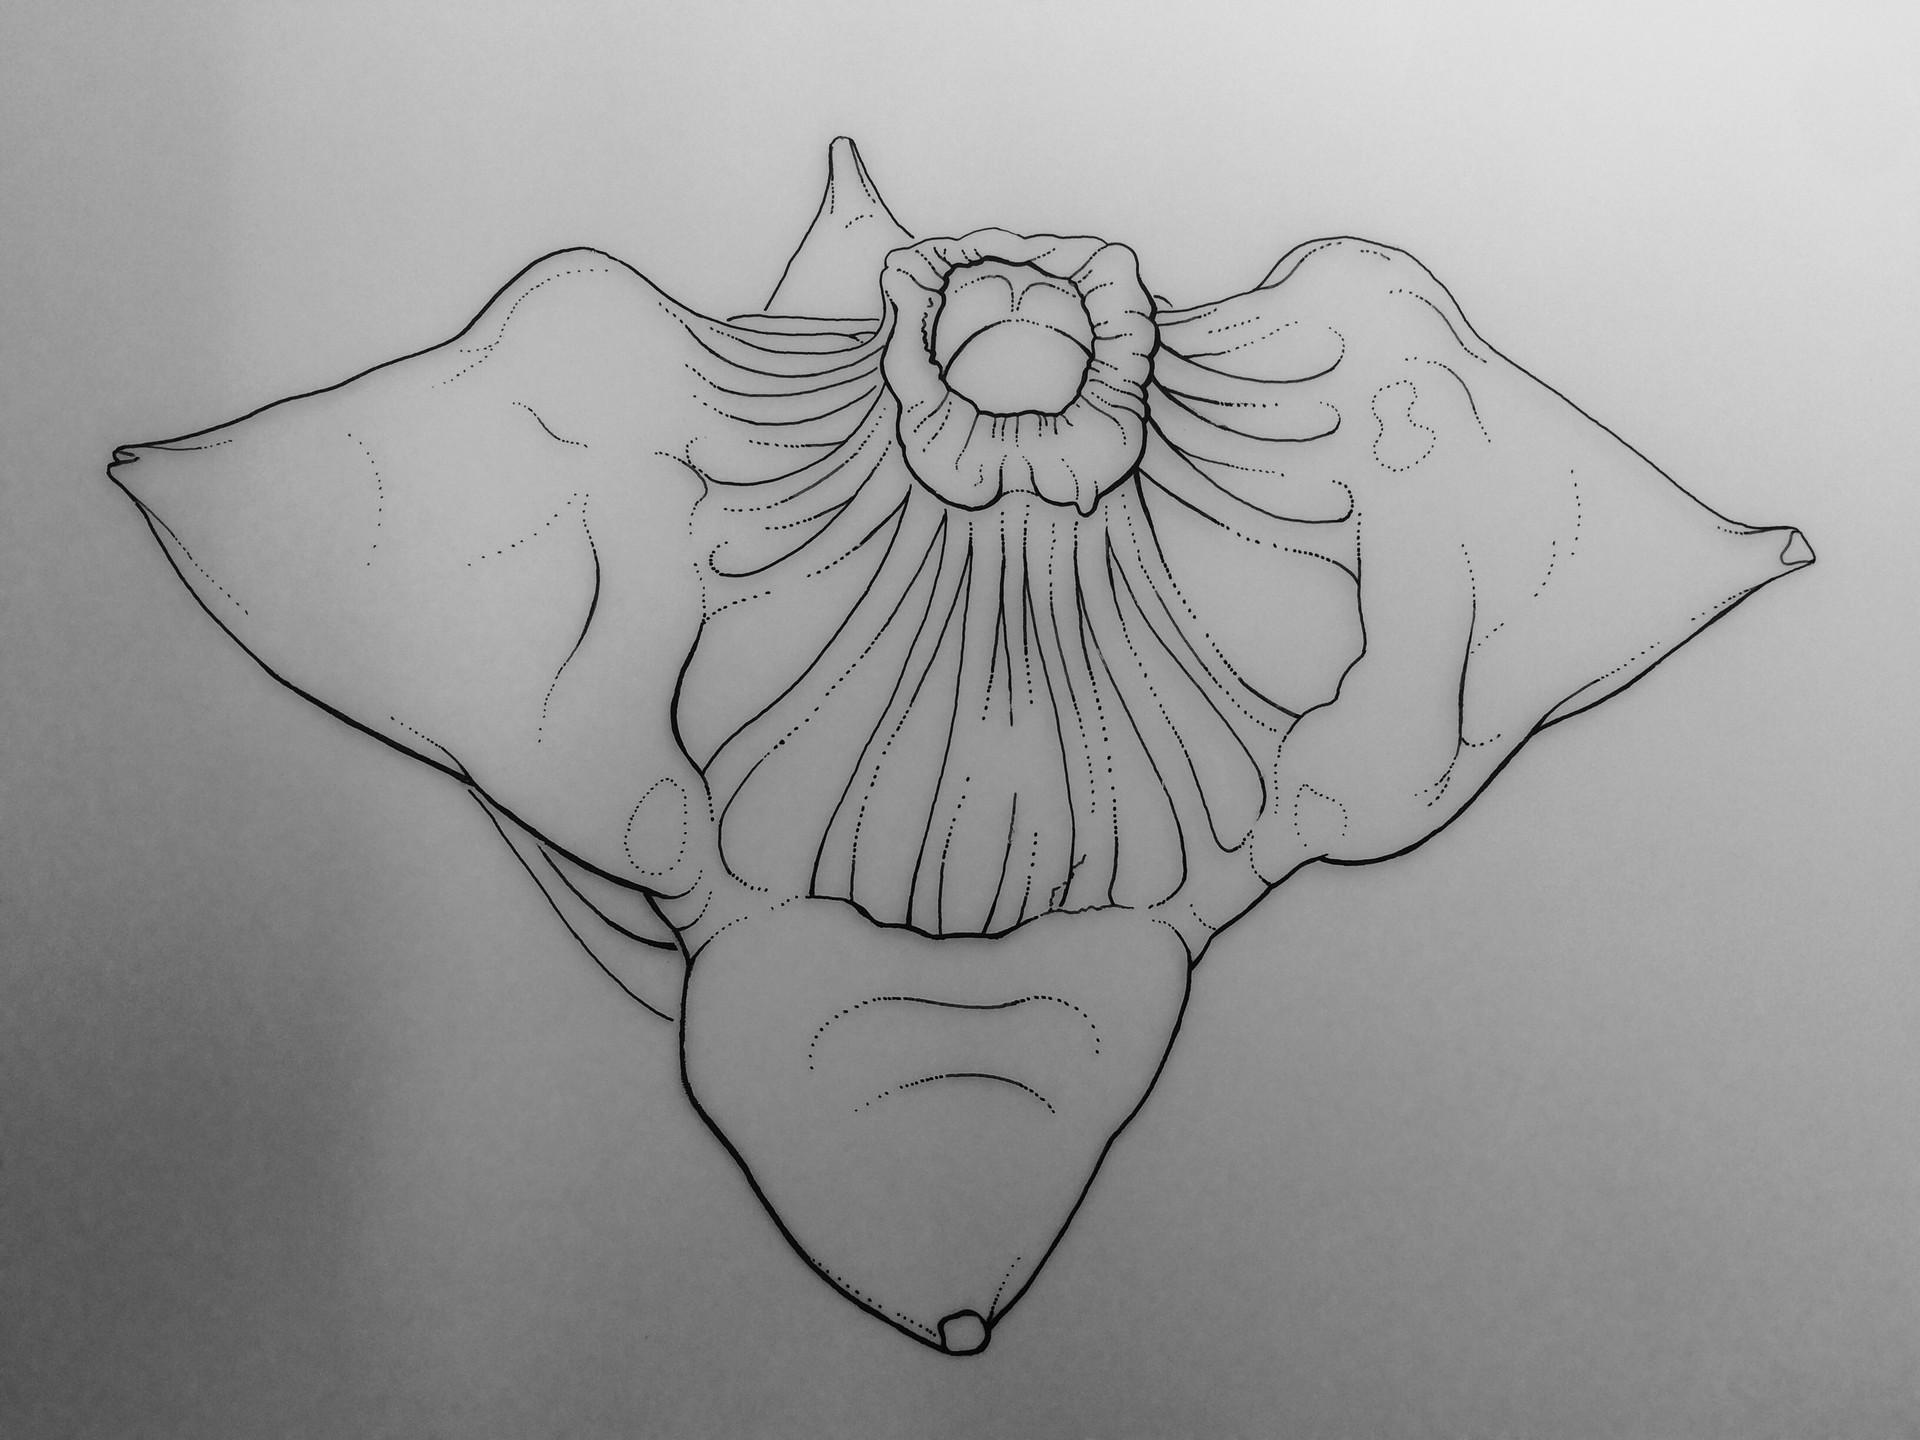 Water caltrop seed, linework